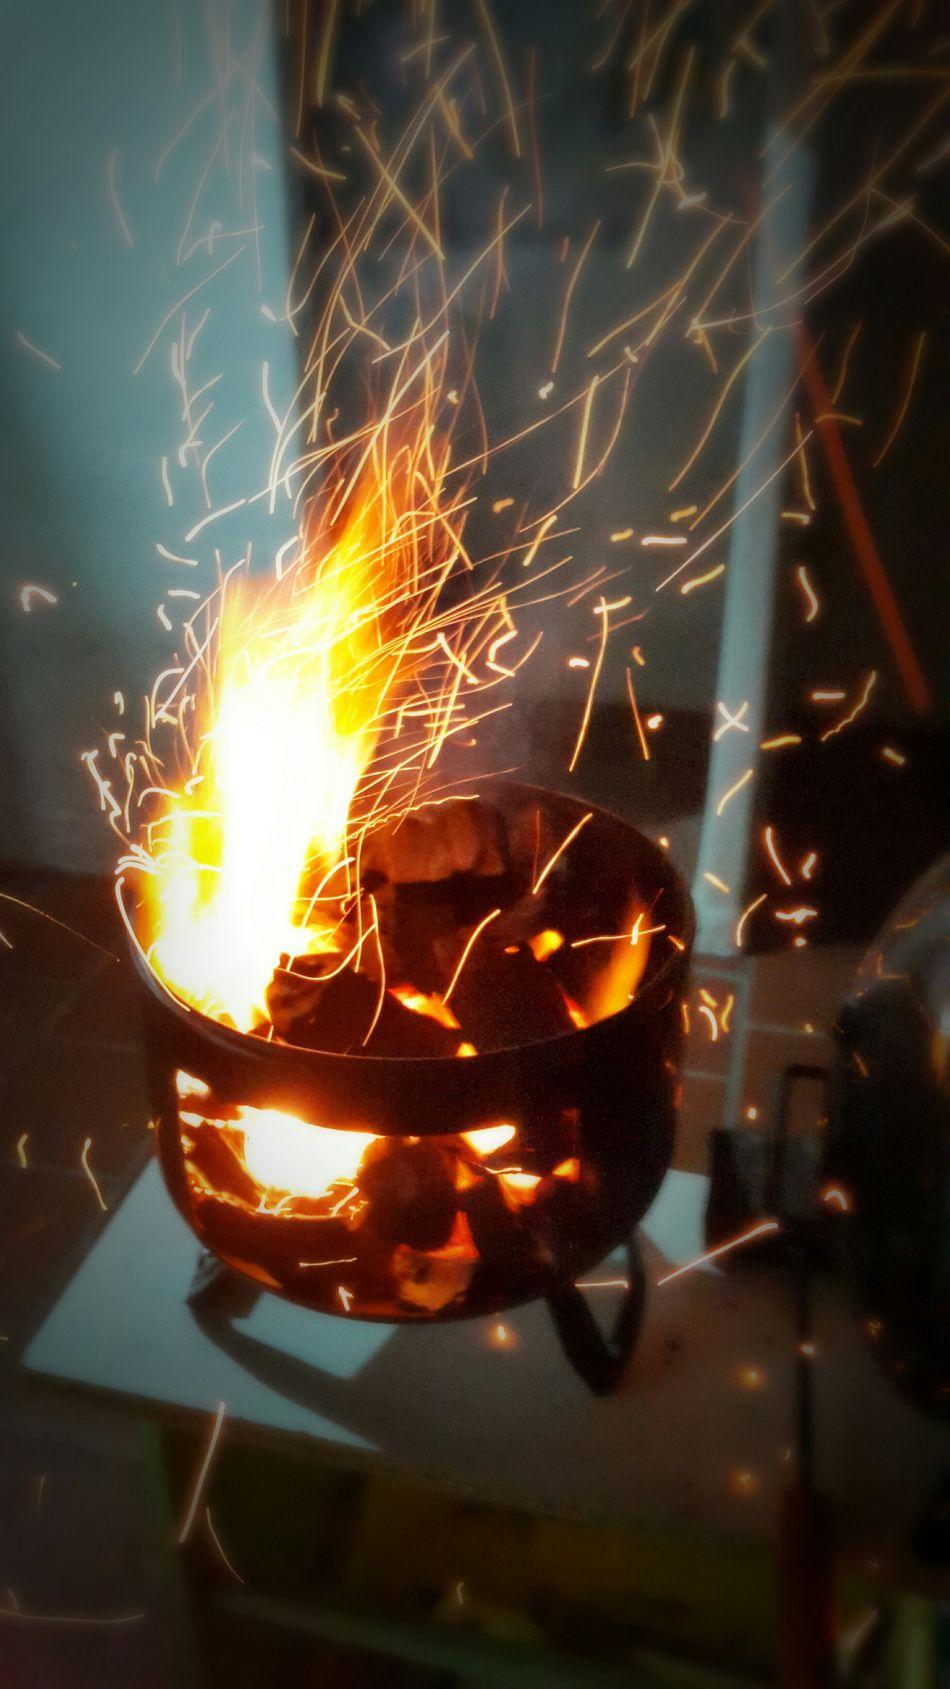 Fogon Carbon Carbonero Fuego Argentina Photography Brasas Chispas